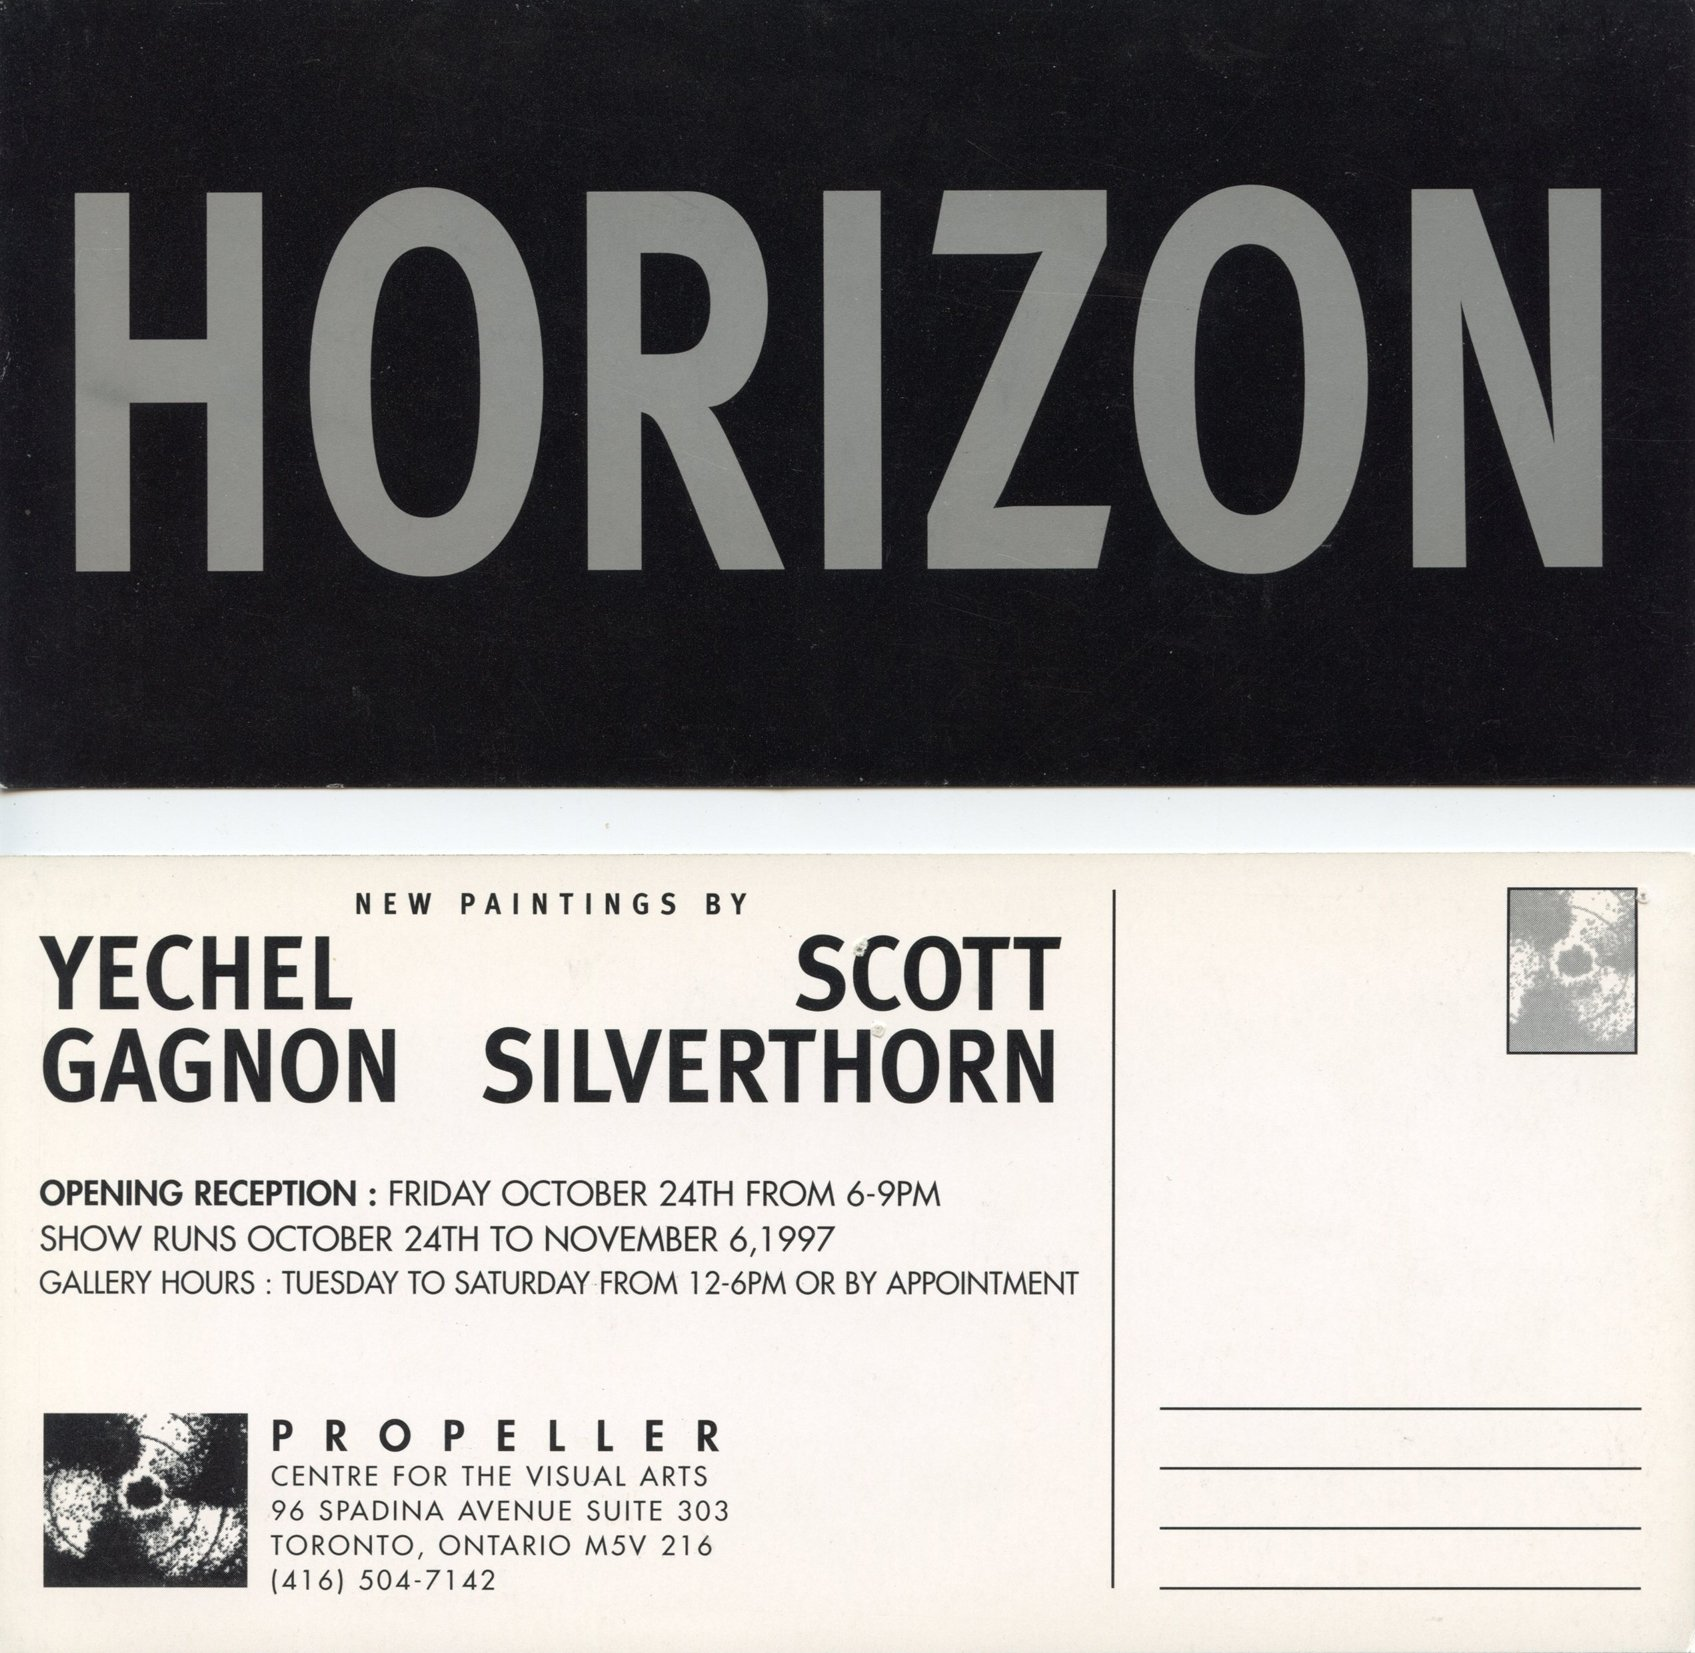 Horizon | Yechel Gagnon & Scott Silverthorn